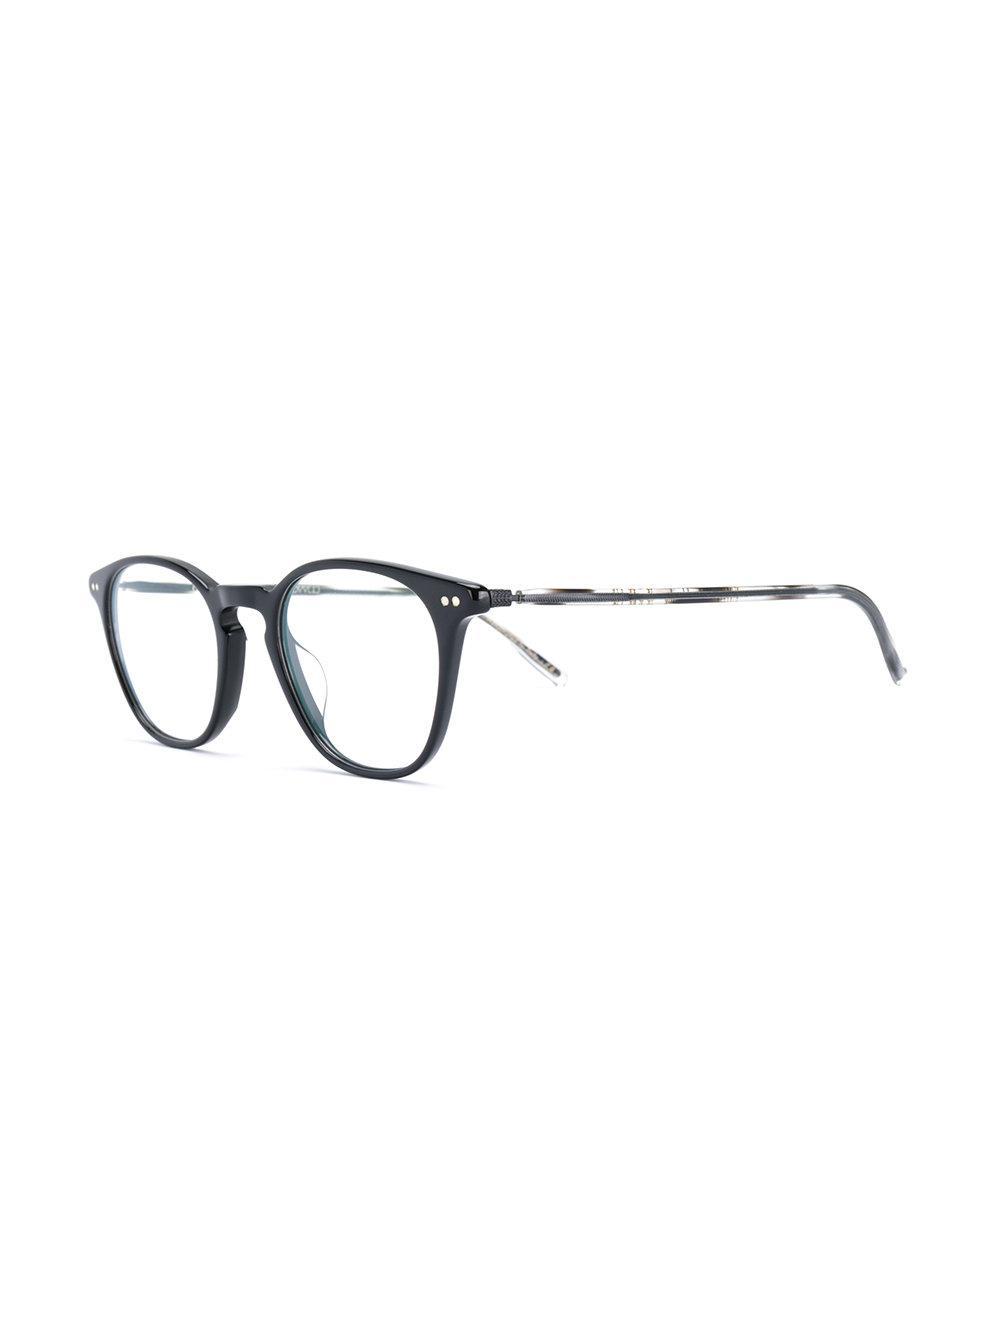 78e8976170 Oliver Peoples - Black Hanks Round Frame Sunglasses - Lyst. View fullscreen